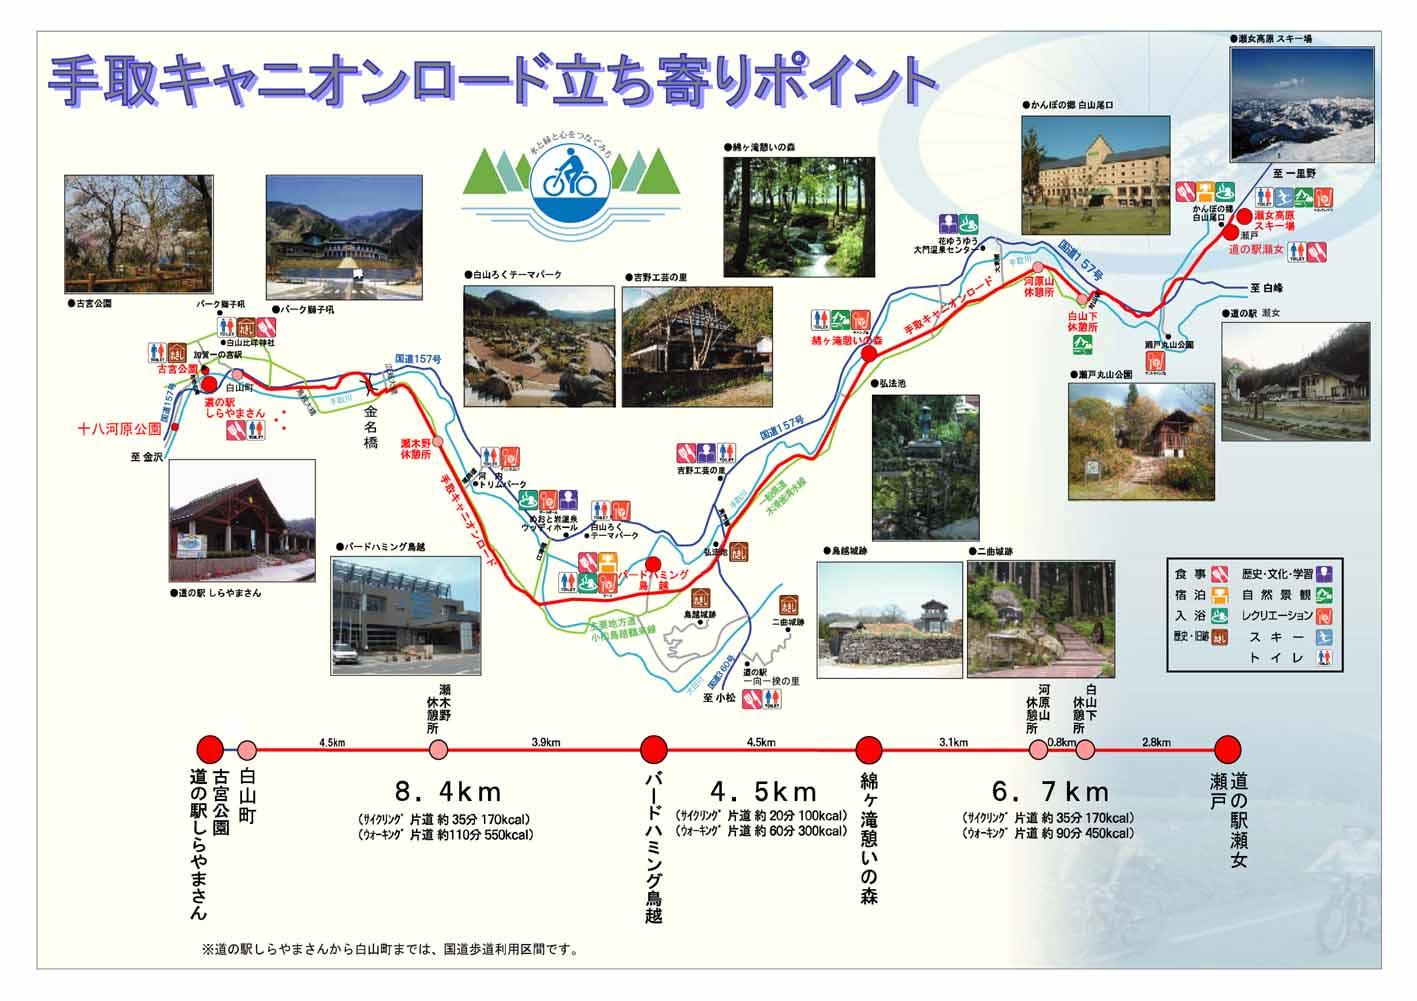 http://www.pref.ishikawa.jp/douken/page3/office04/images/panhu.jpg